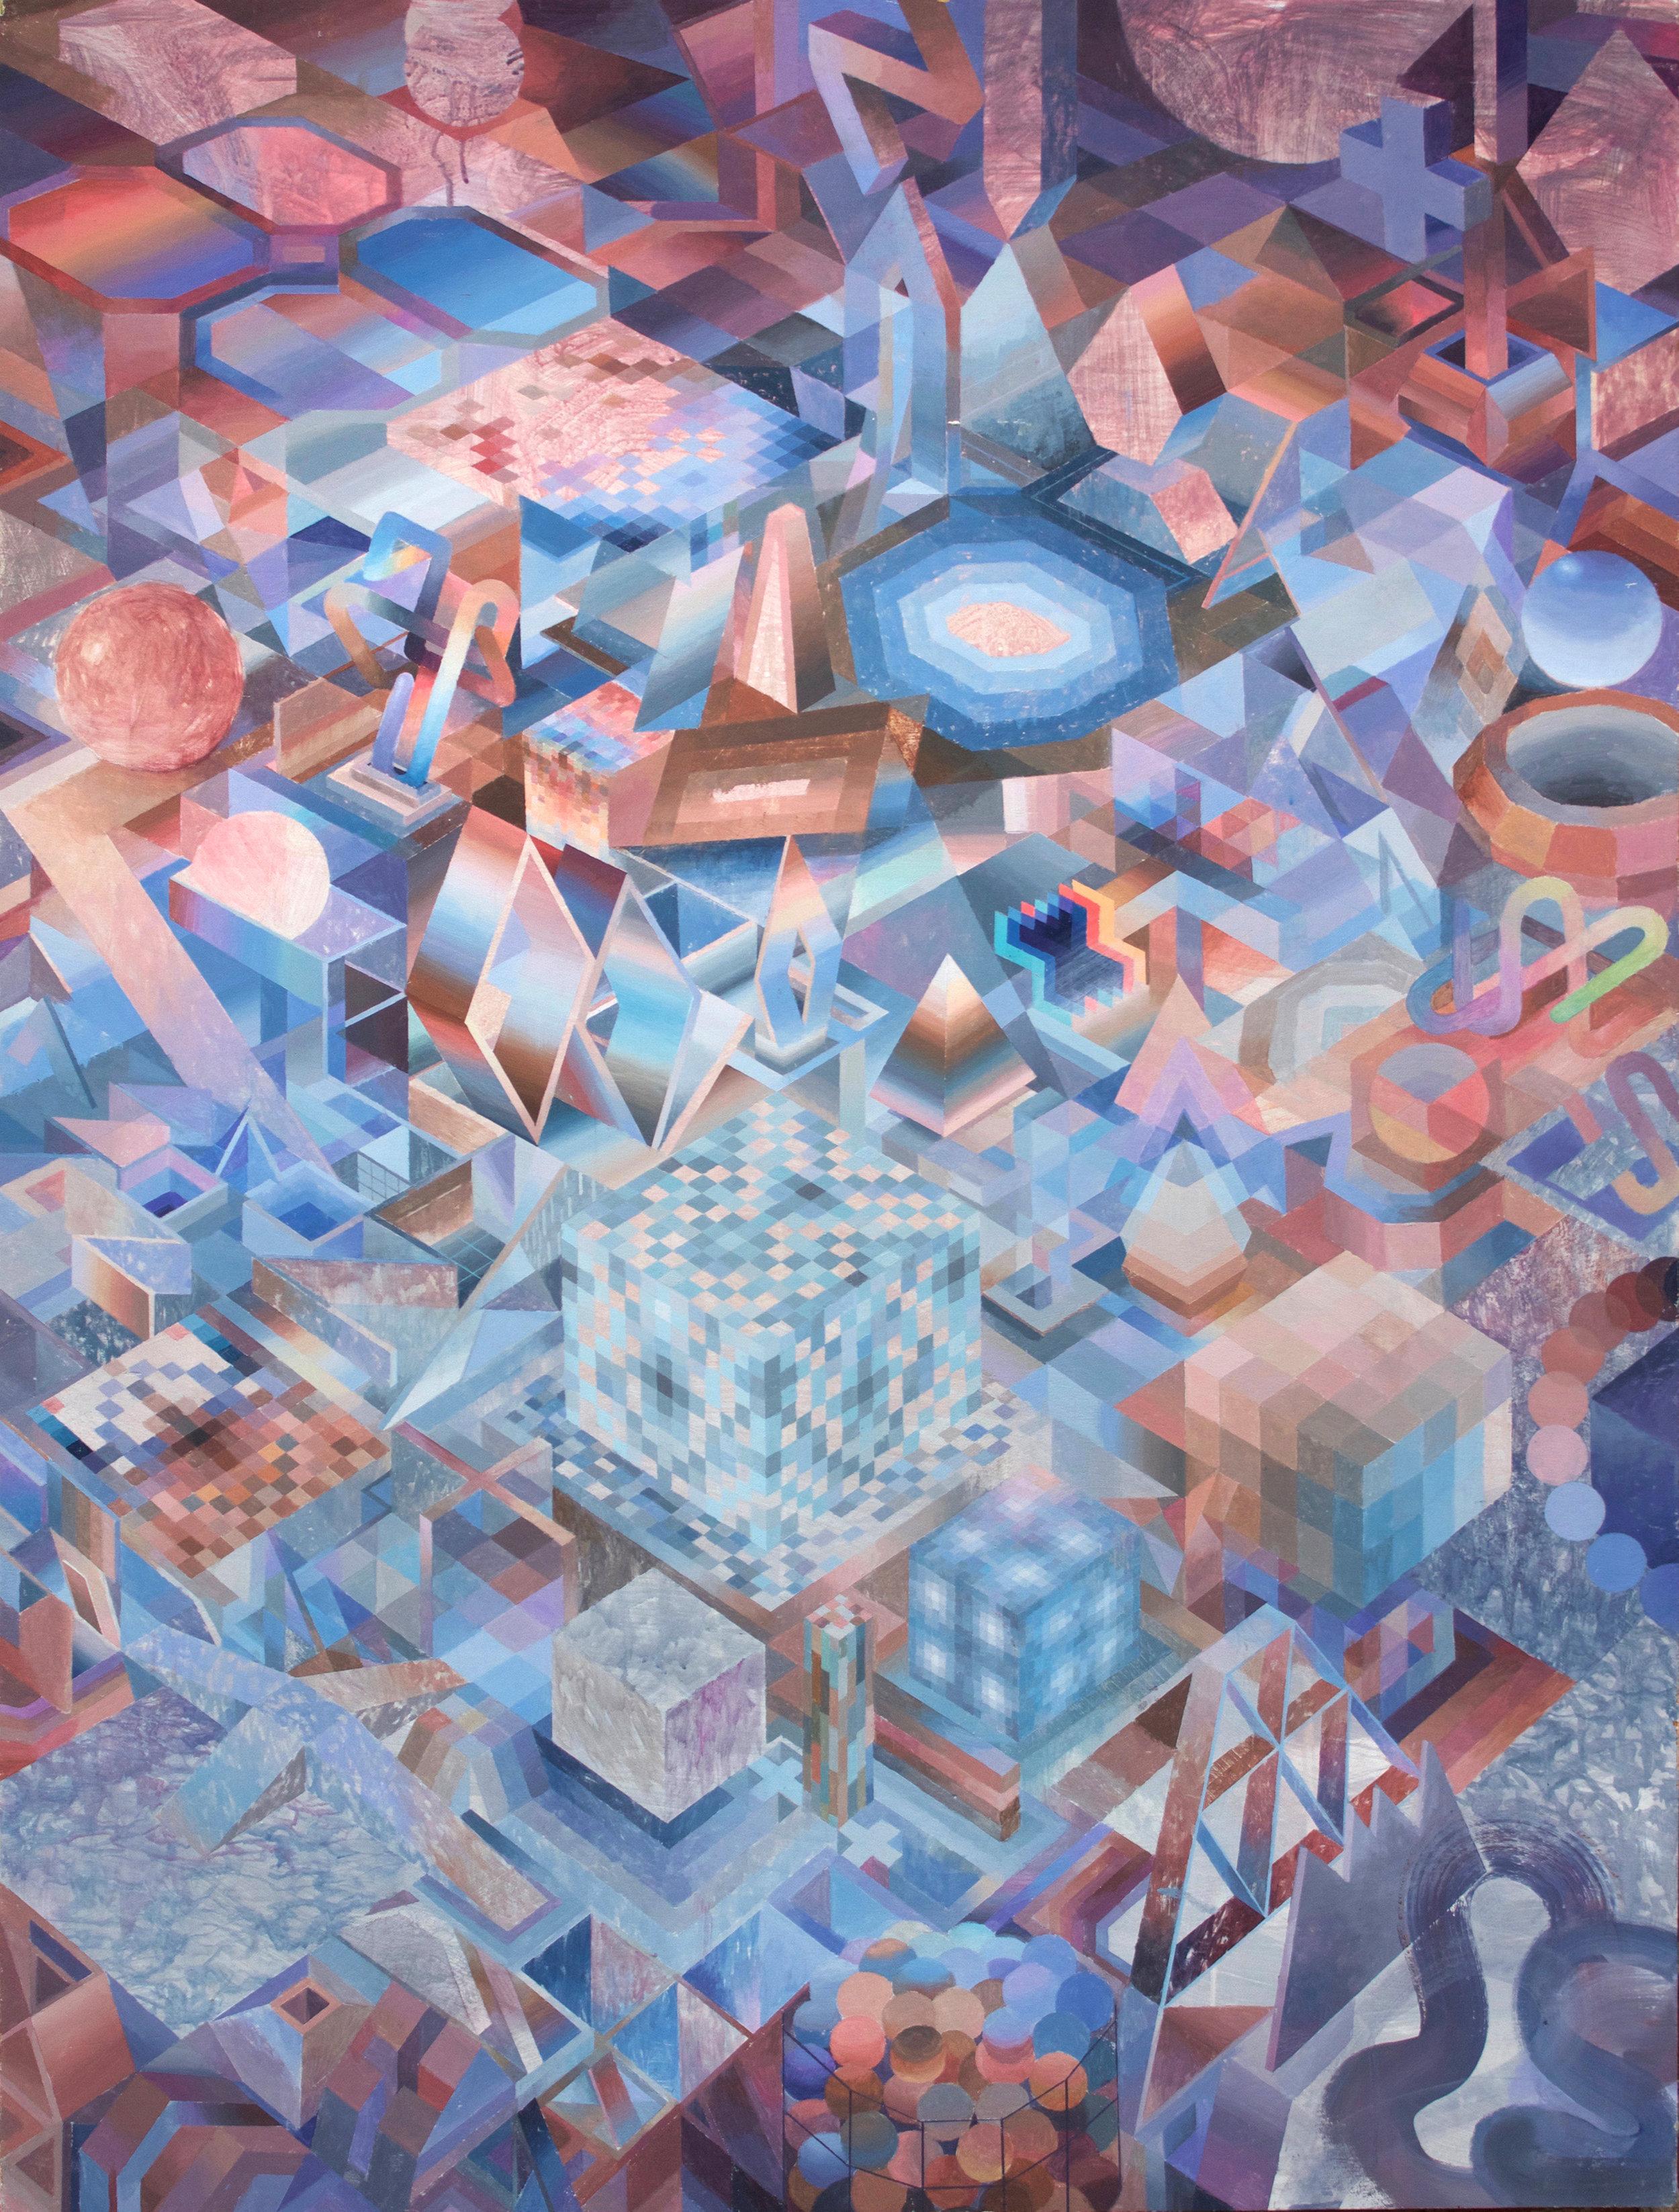 Eli McMullen Space Garden acrylic on panel 36 in. x 48 in. $2500 2016.jpg